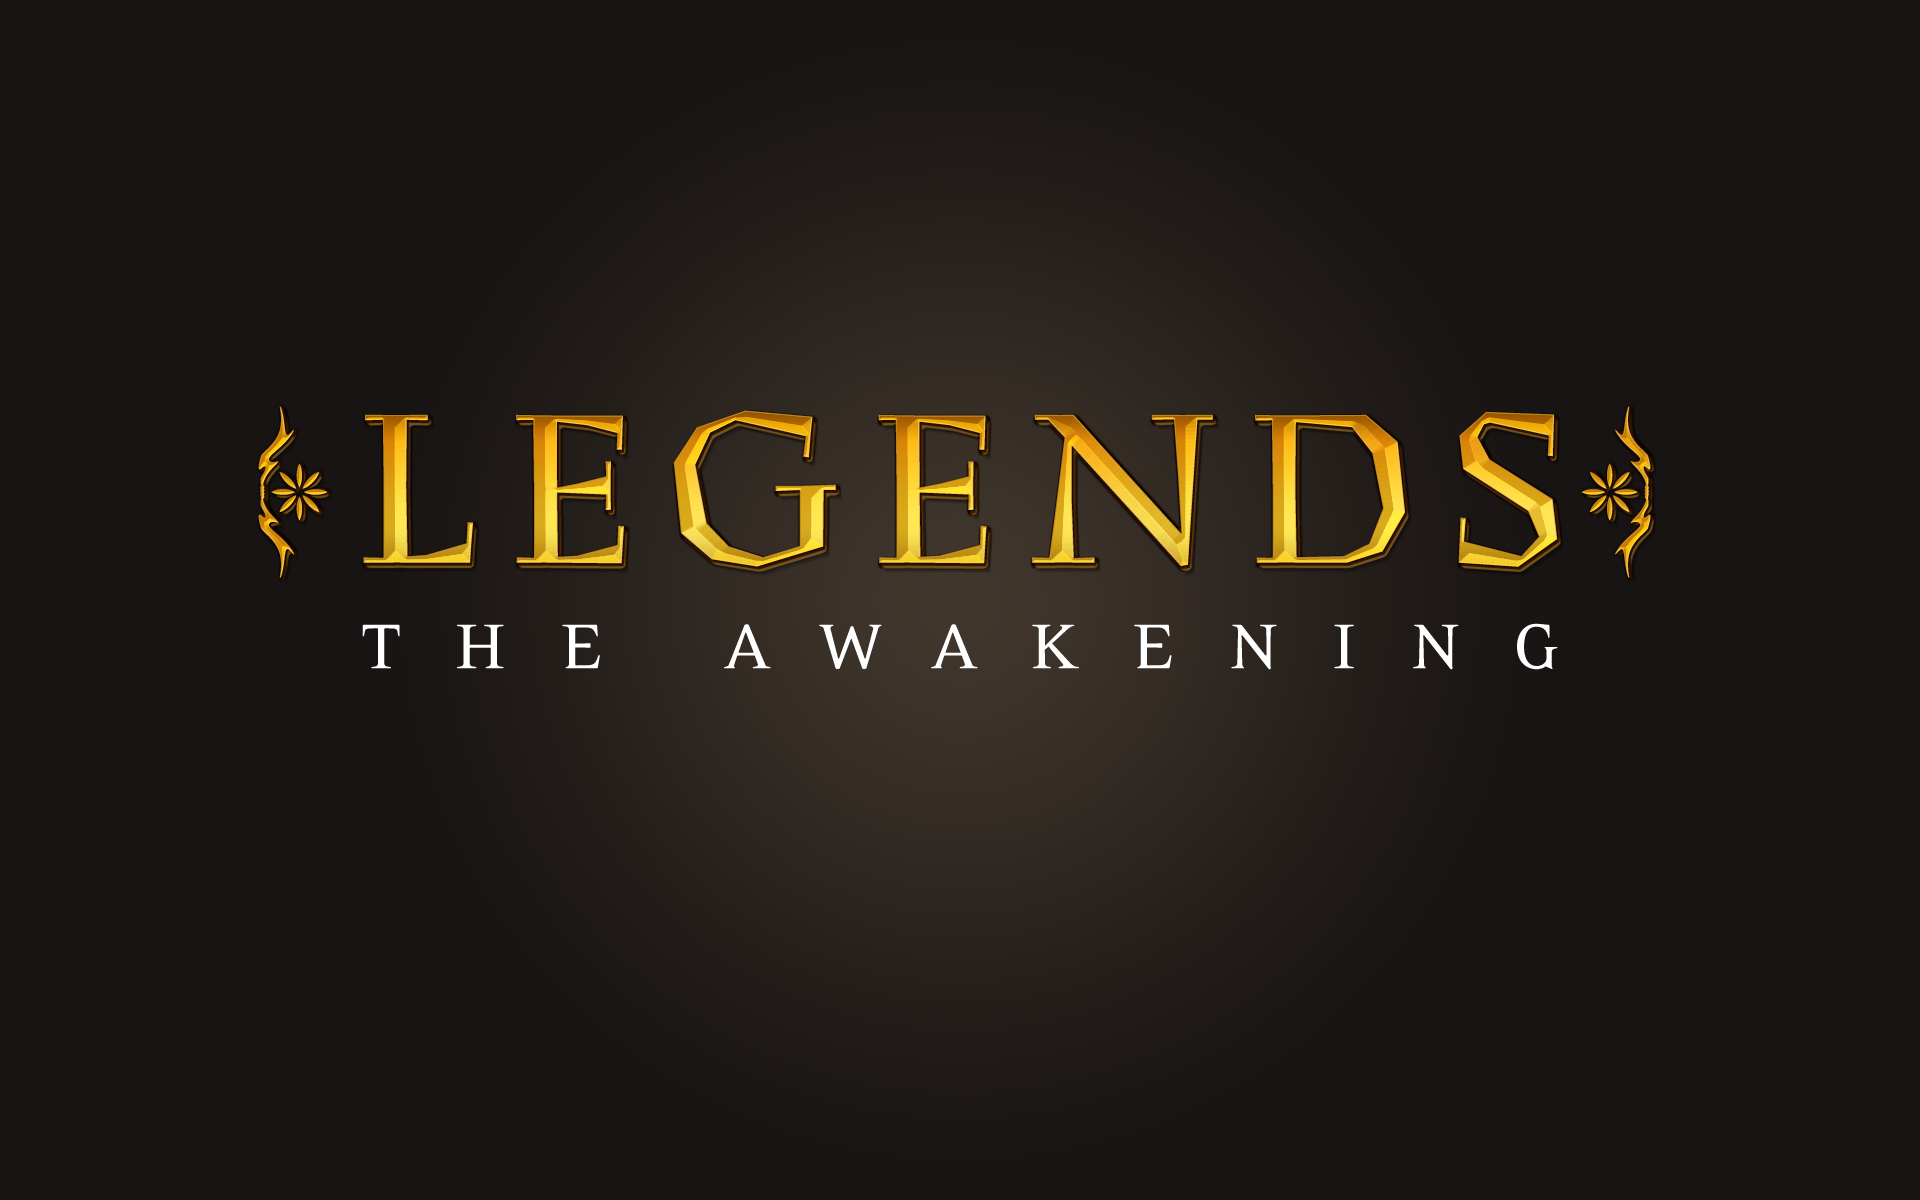 Legends The Awakening